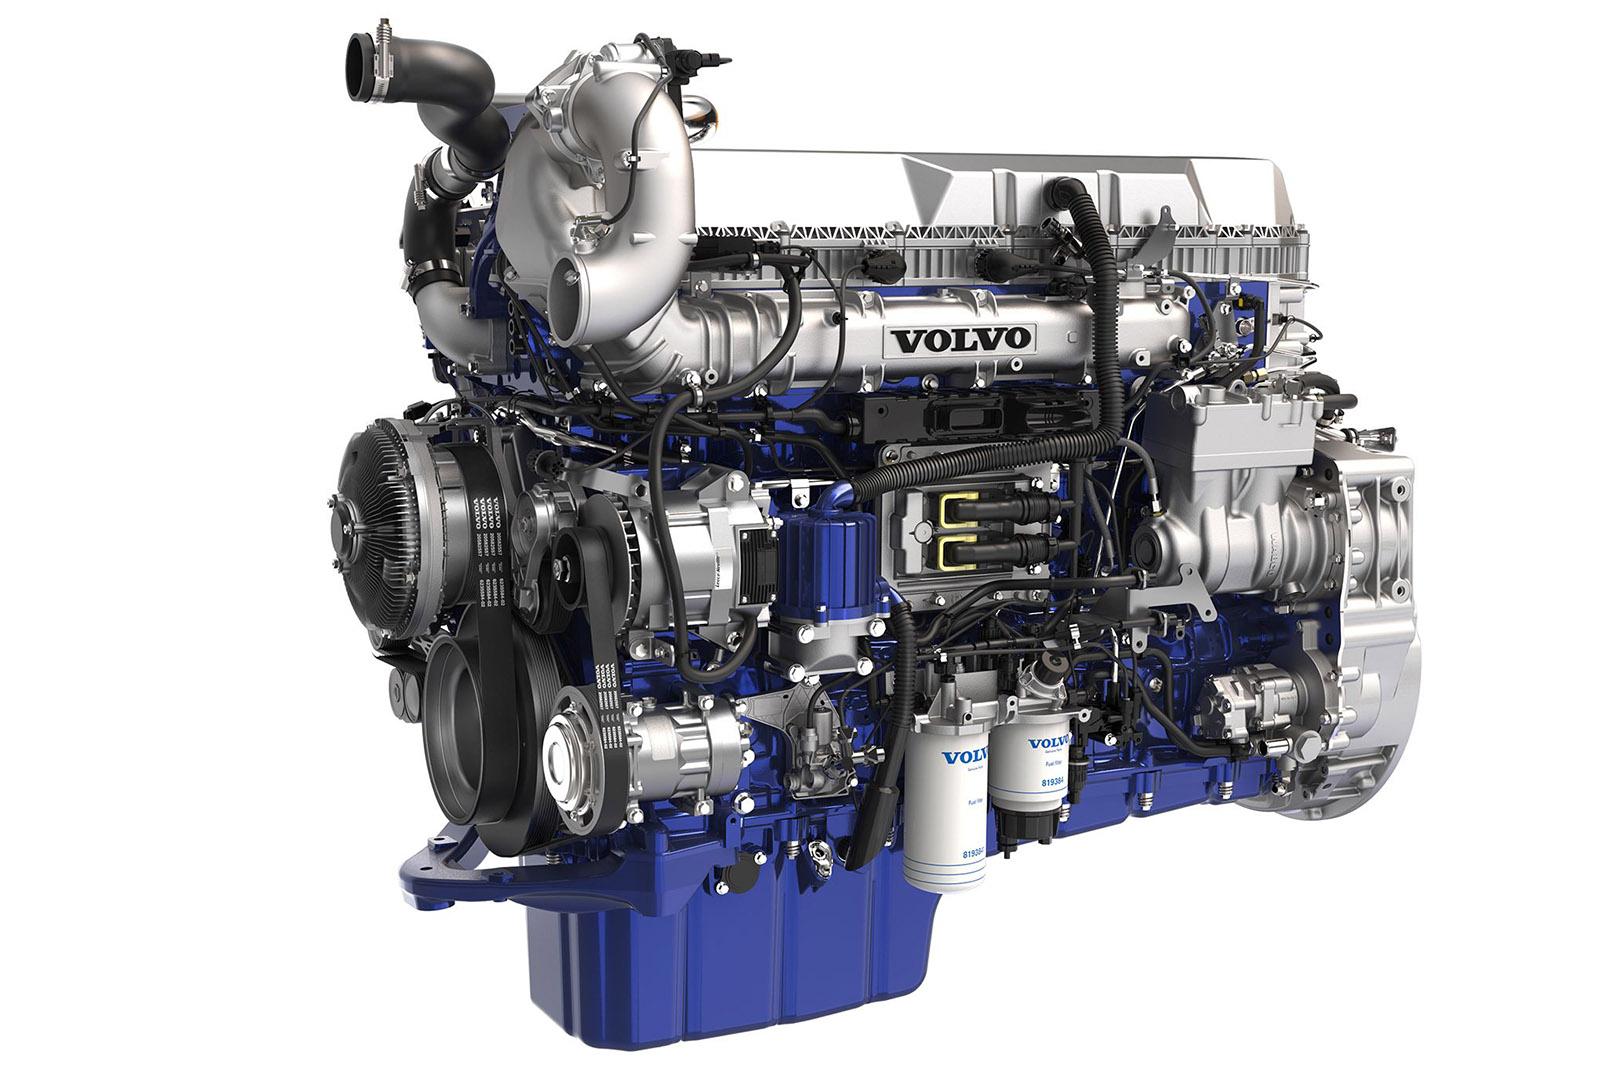 Volvo Truck D13 Engine Diagram 05 Freestyle Wiring Diagram Tao Tao ...